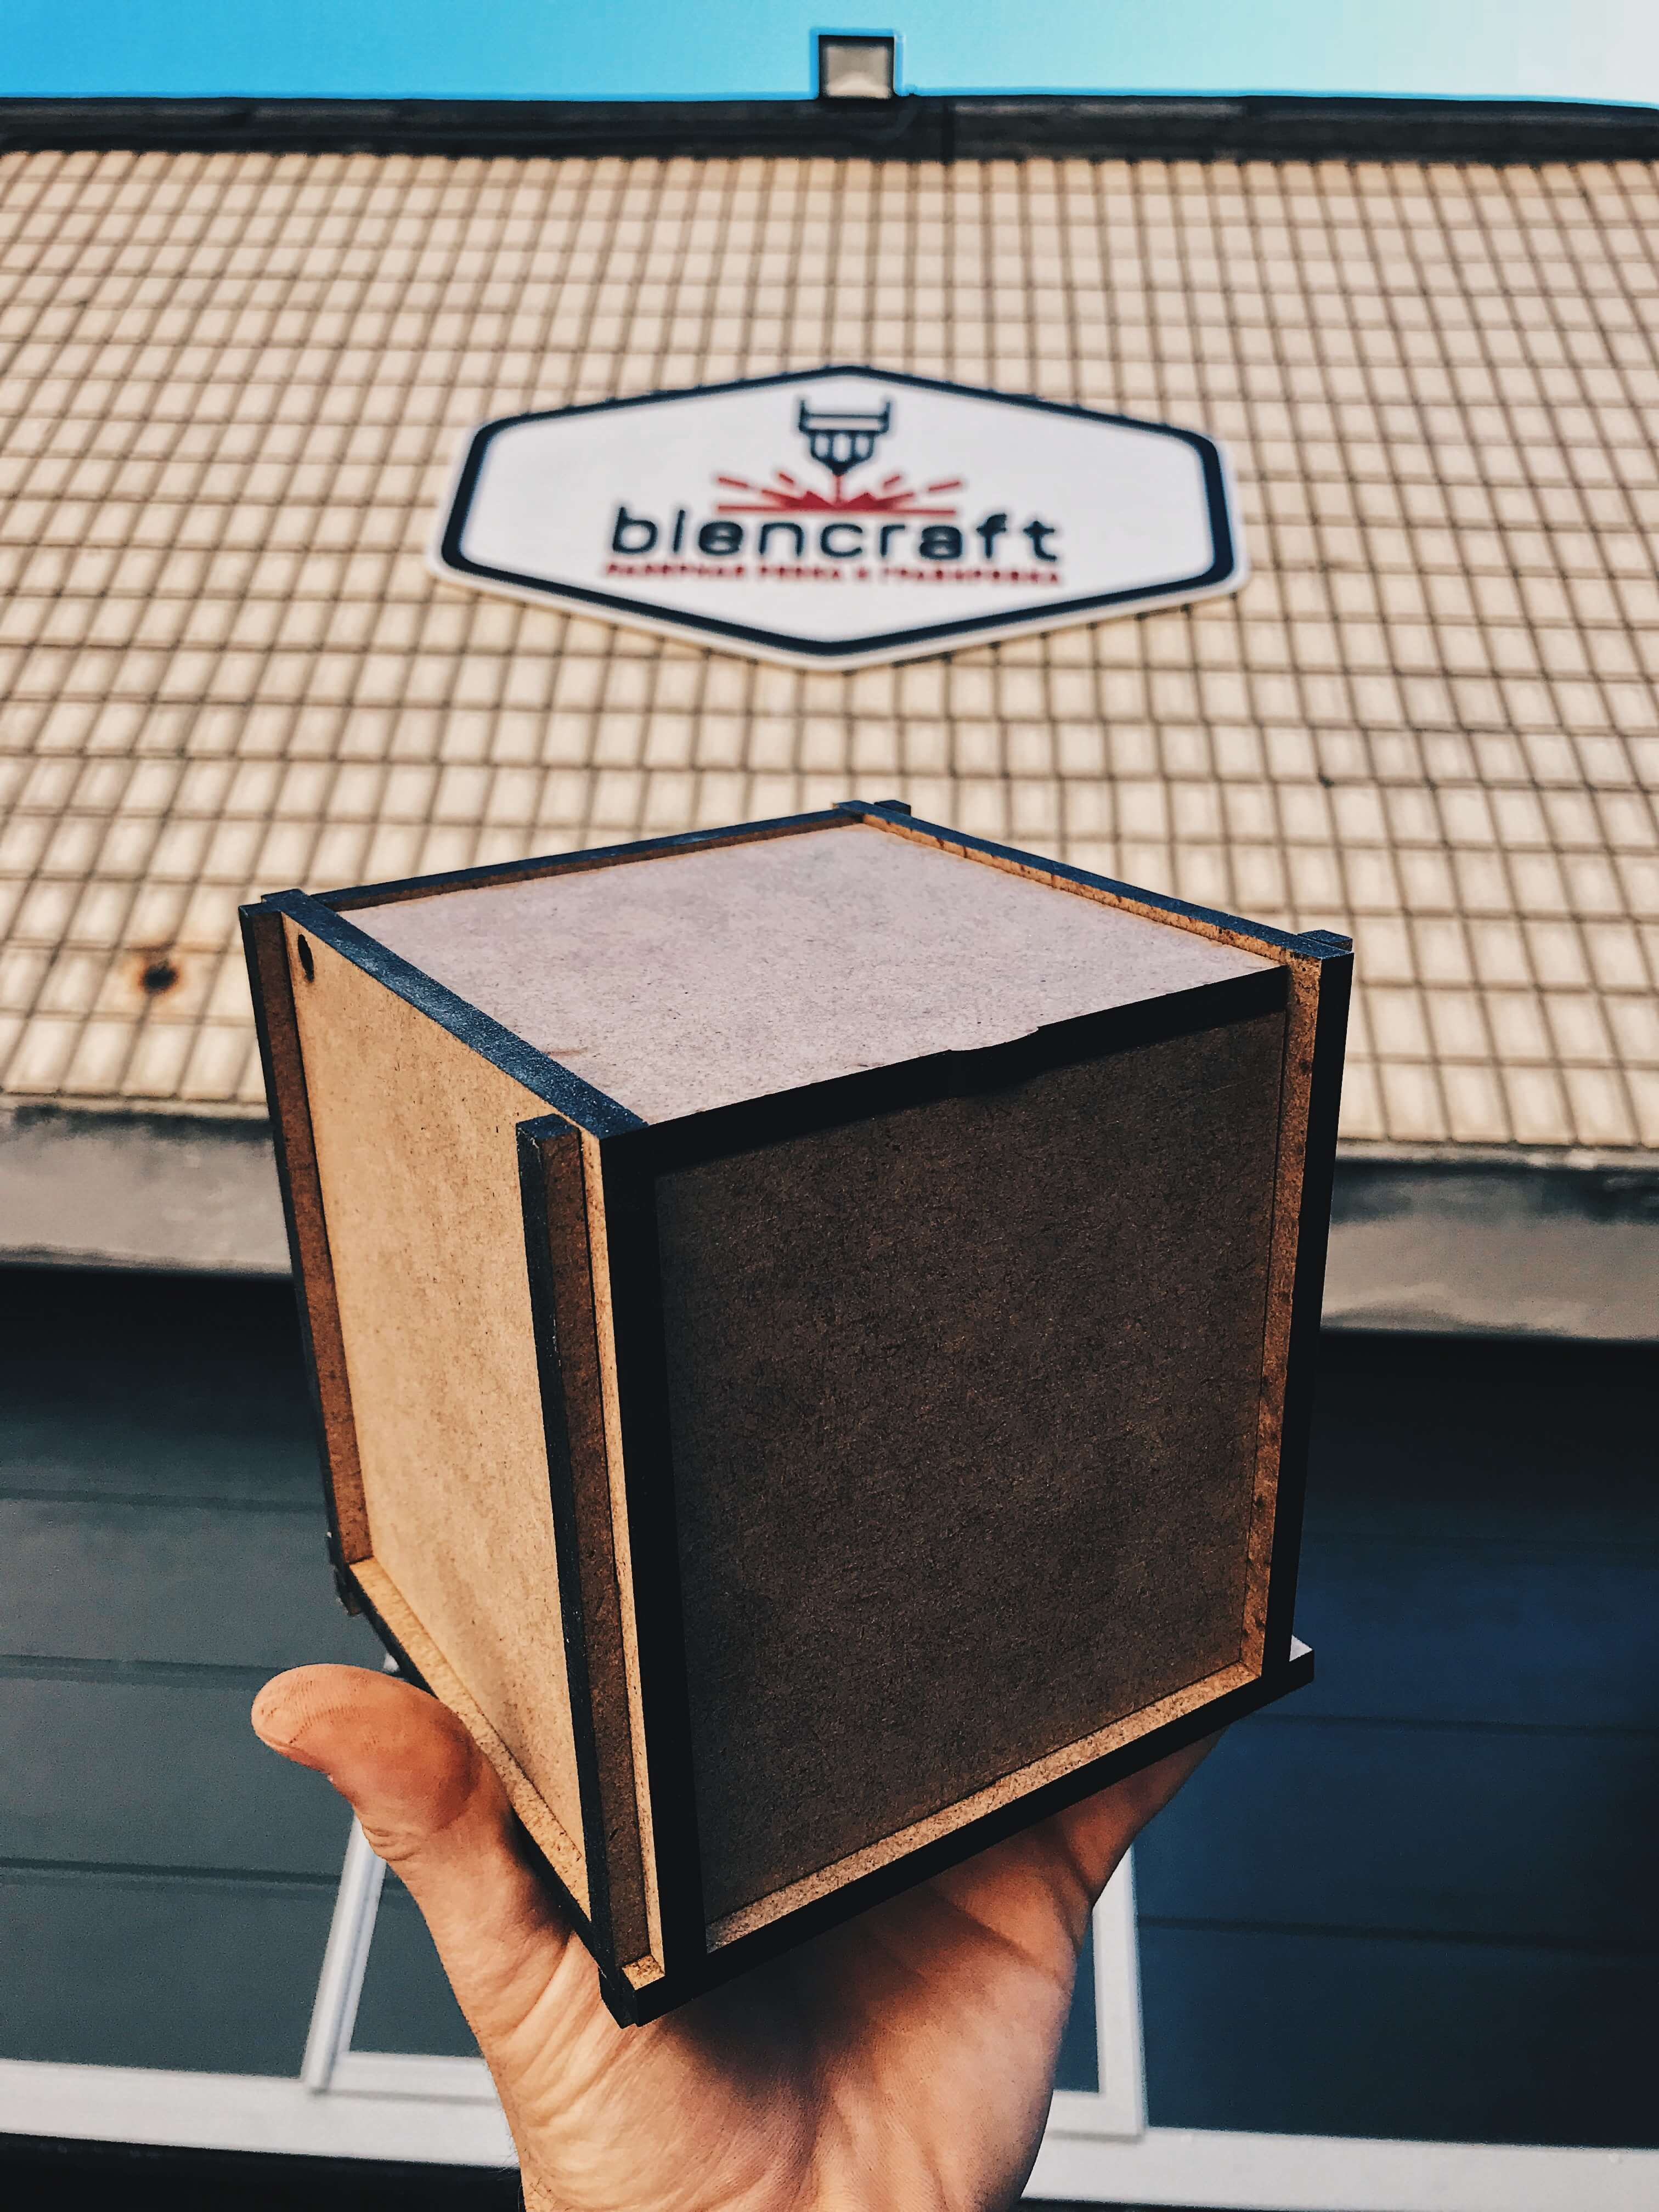 biencraft - лазерная резка и гравировка 5